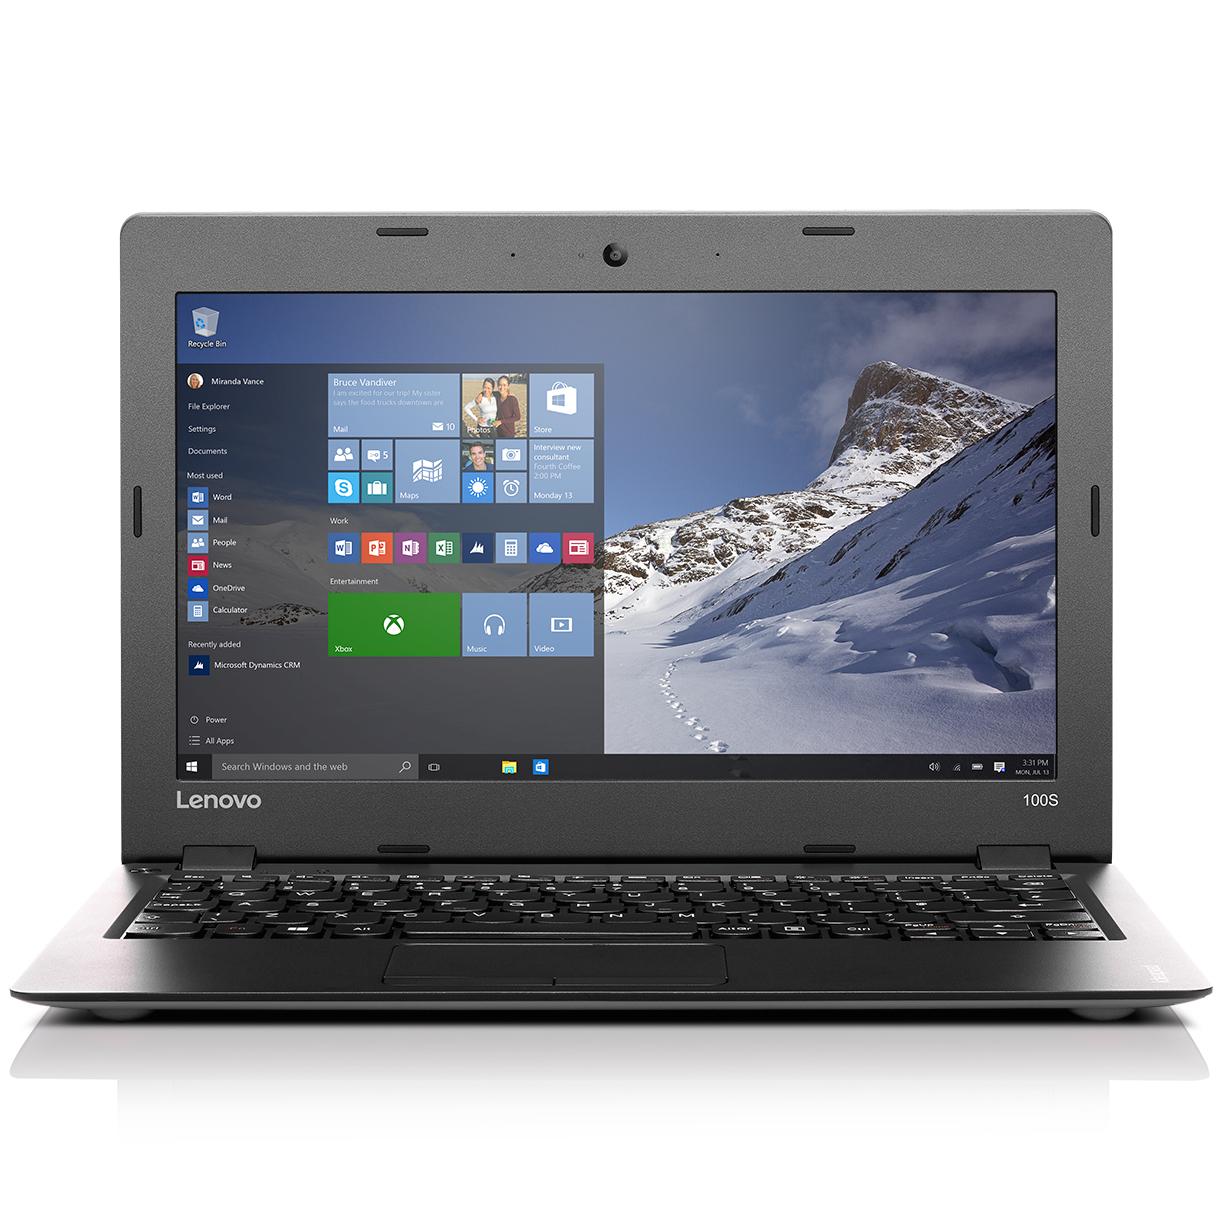 Лаптоп Lenovo IdeaPad 100s, 80R900NKBM